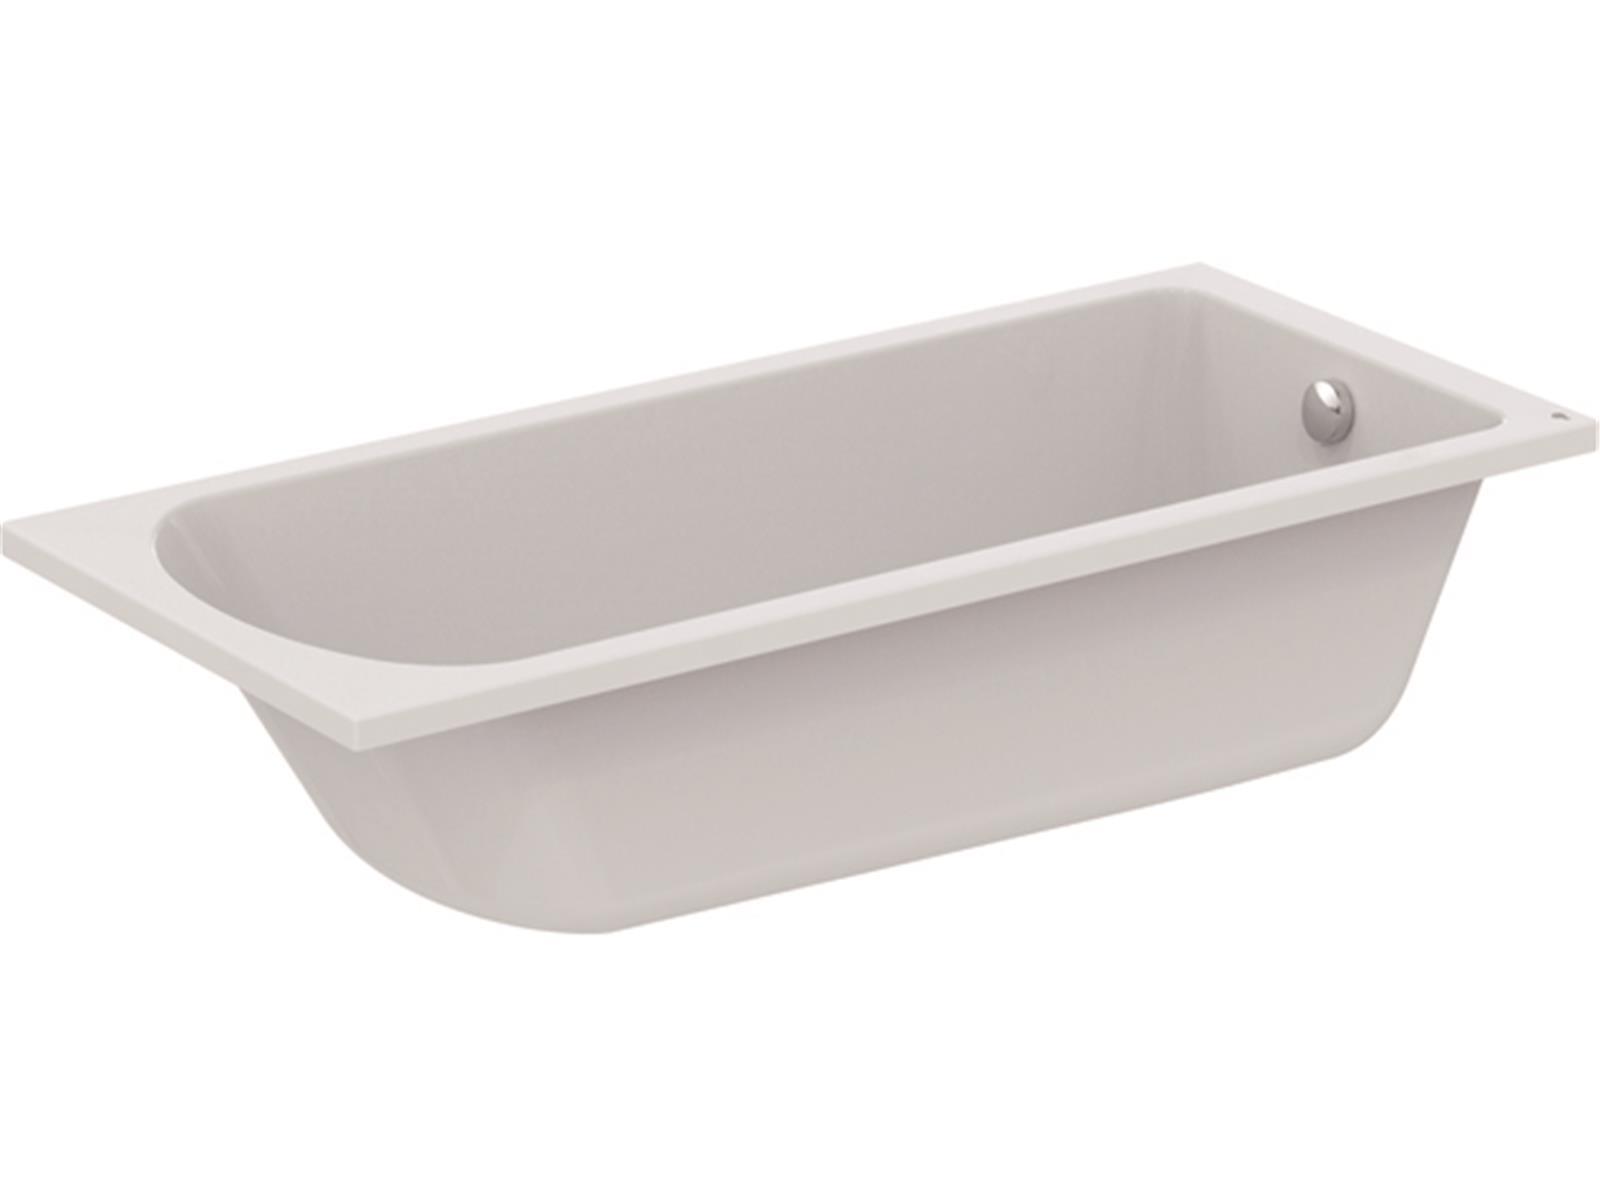 IS Körperform-Badewanne Hotline Neu 1800x800x465mm Weiß